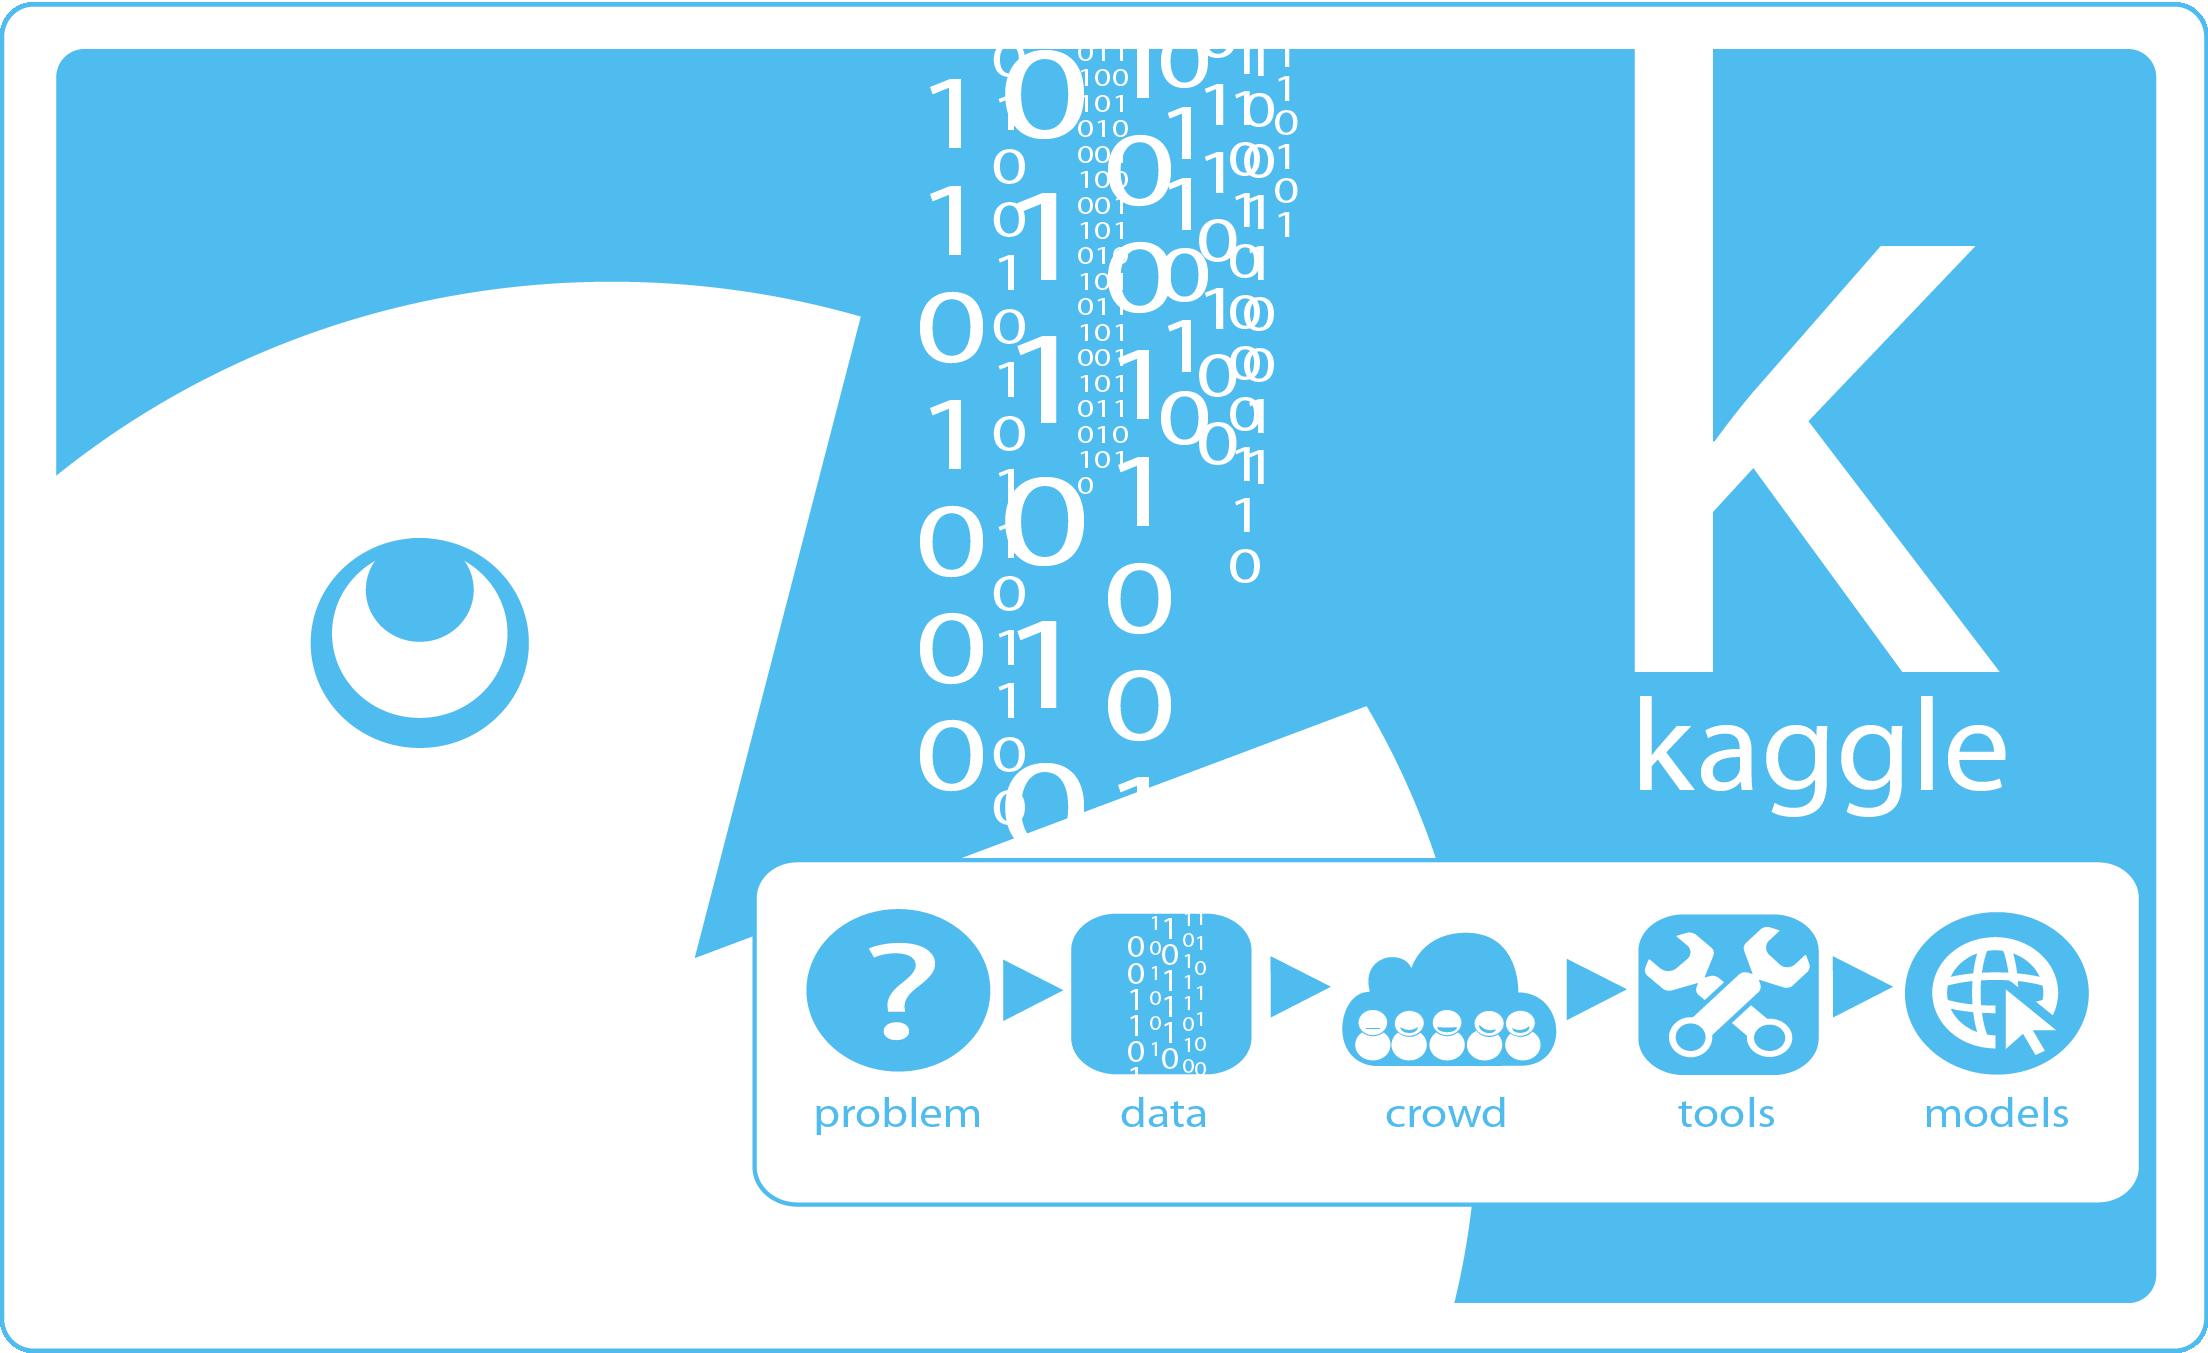 Kaggle – Data Science als Wettkampf